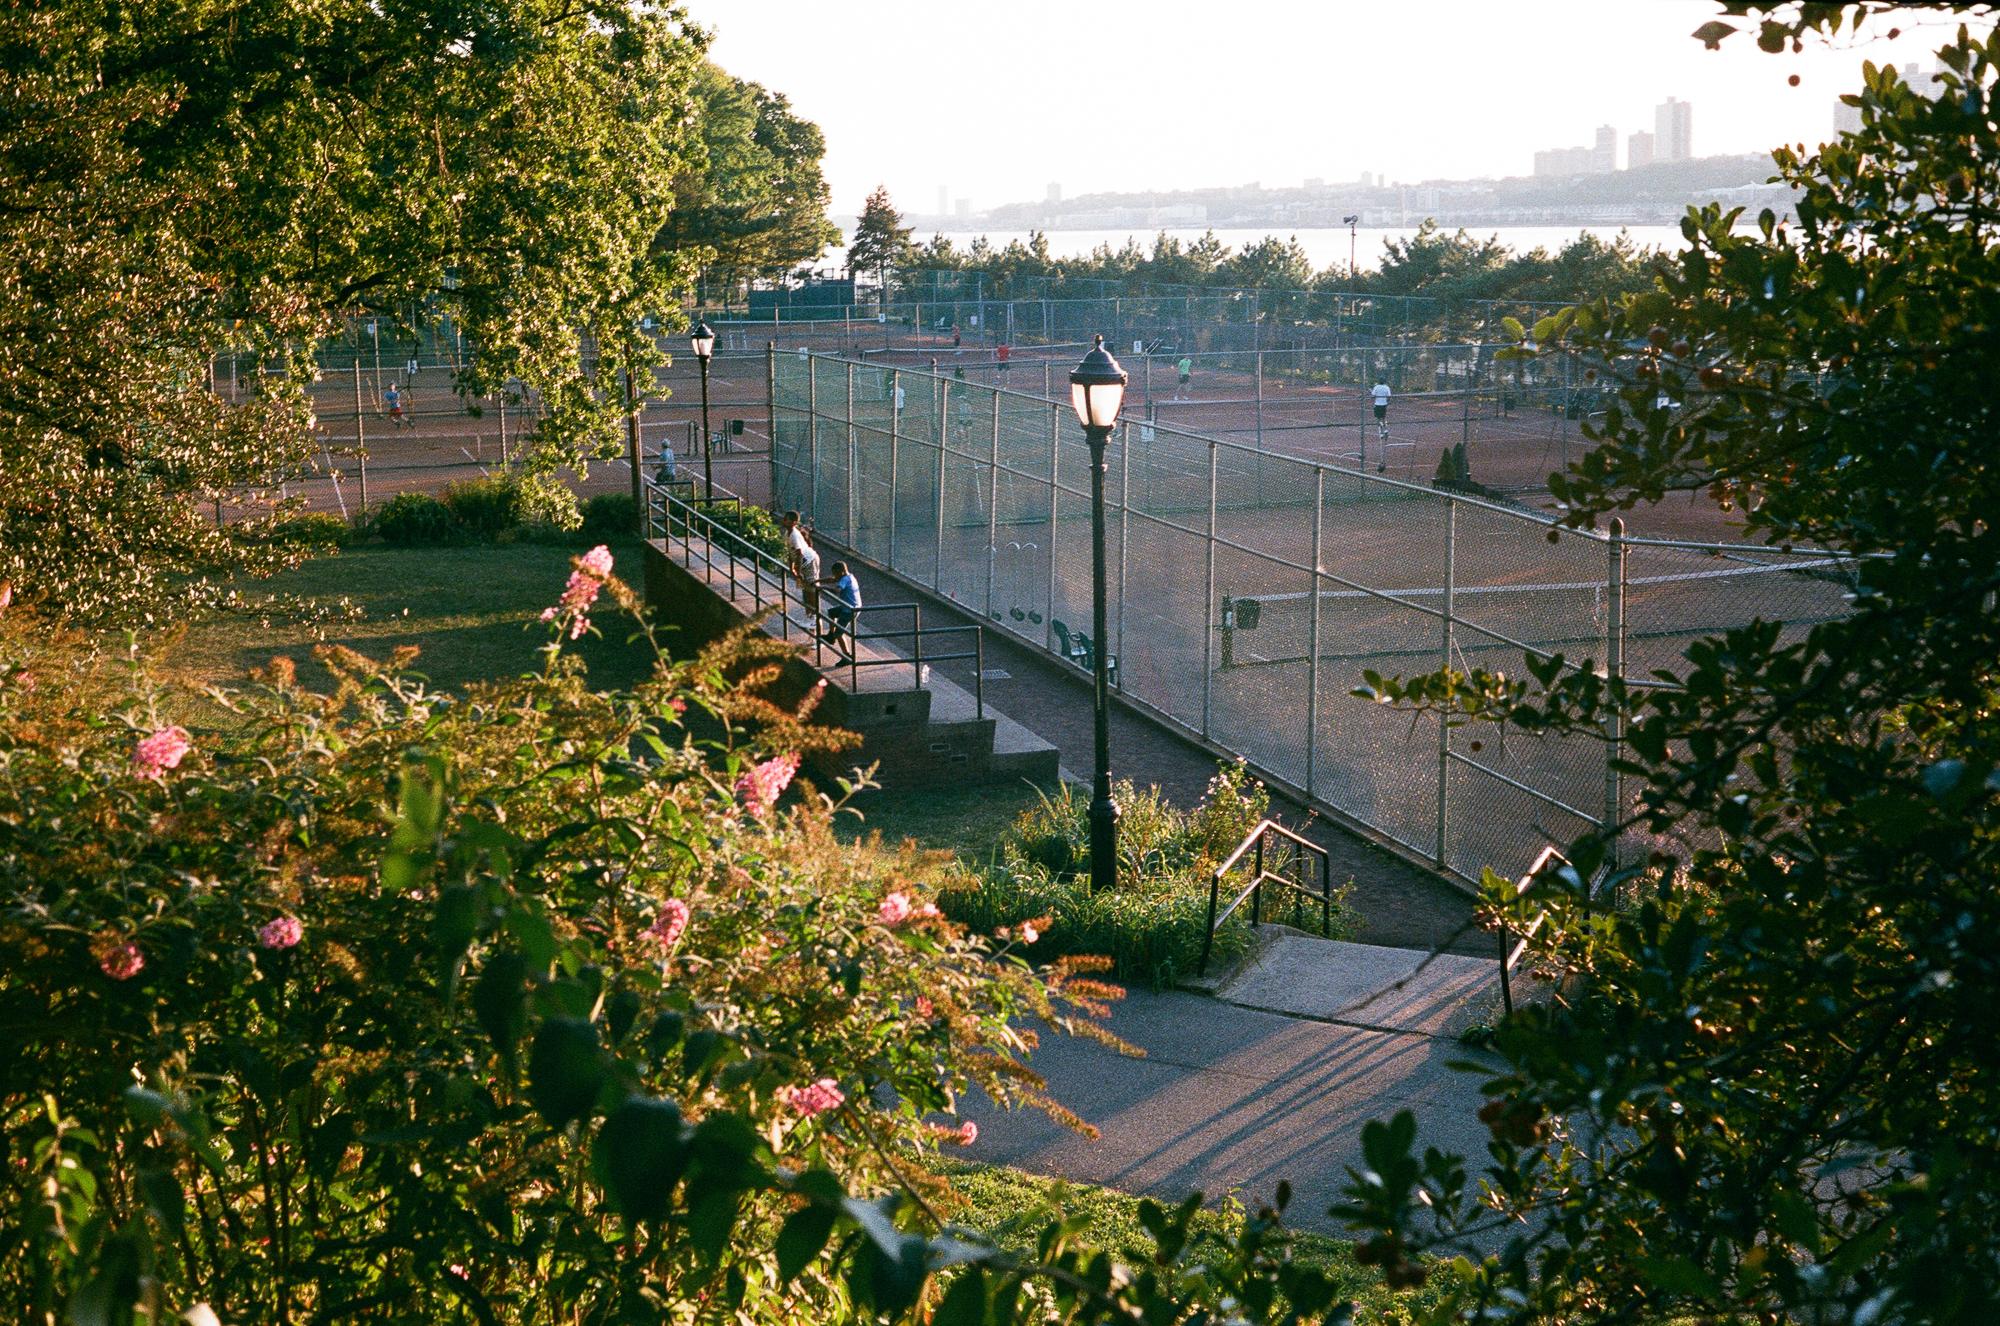 Tennis along the Hudson river. Canonet QL17, Fuji Superia X-Tra 400.